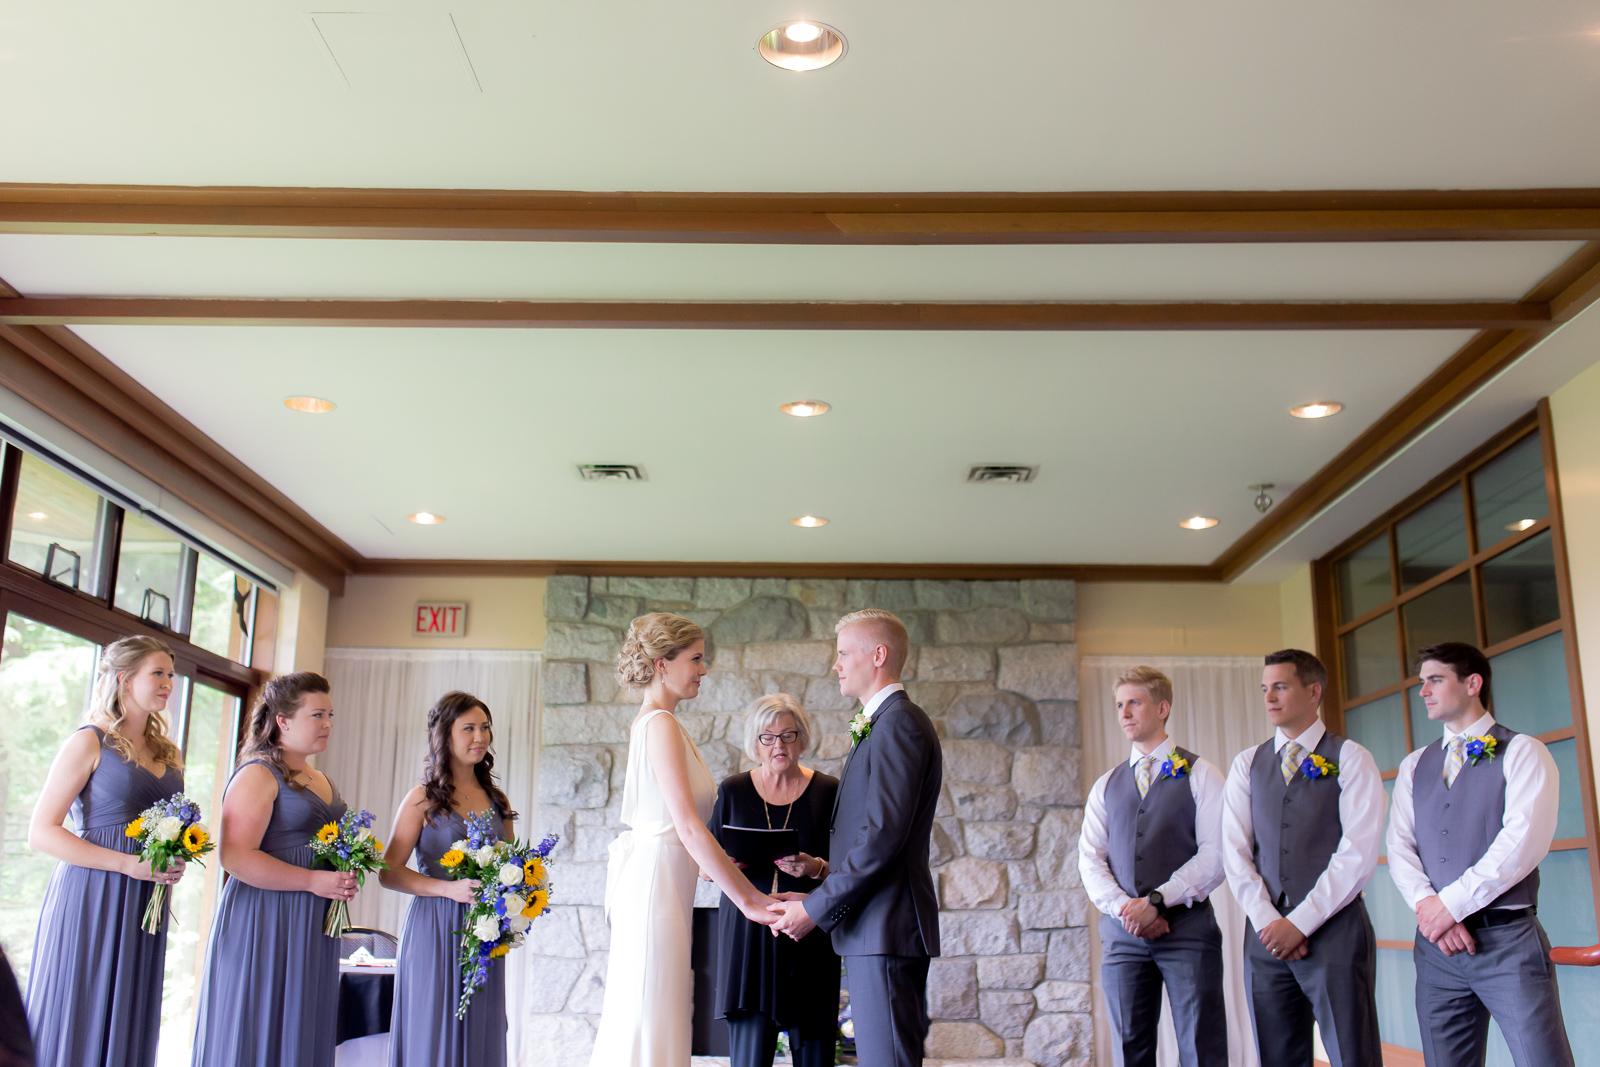 L Amp M S Wedding At Sfu Diamond Alumni Centre Burnaby Wedding Photographer Stef Amp Ryan